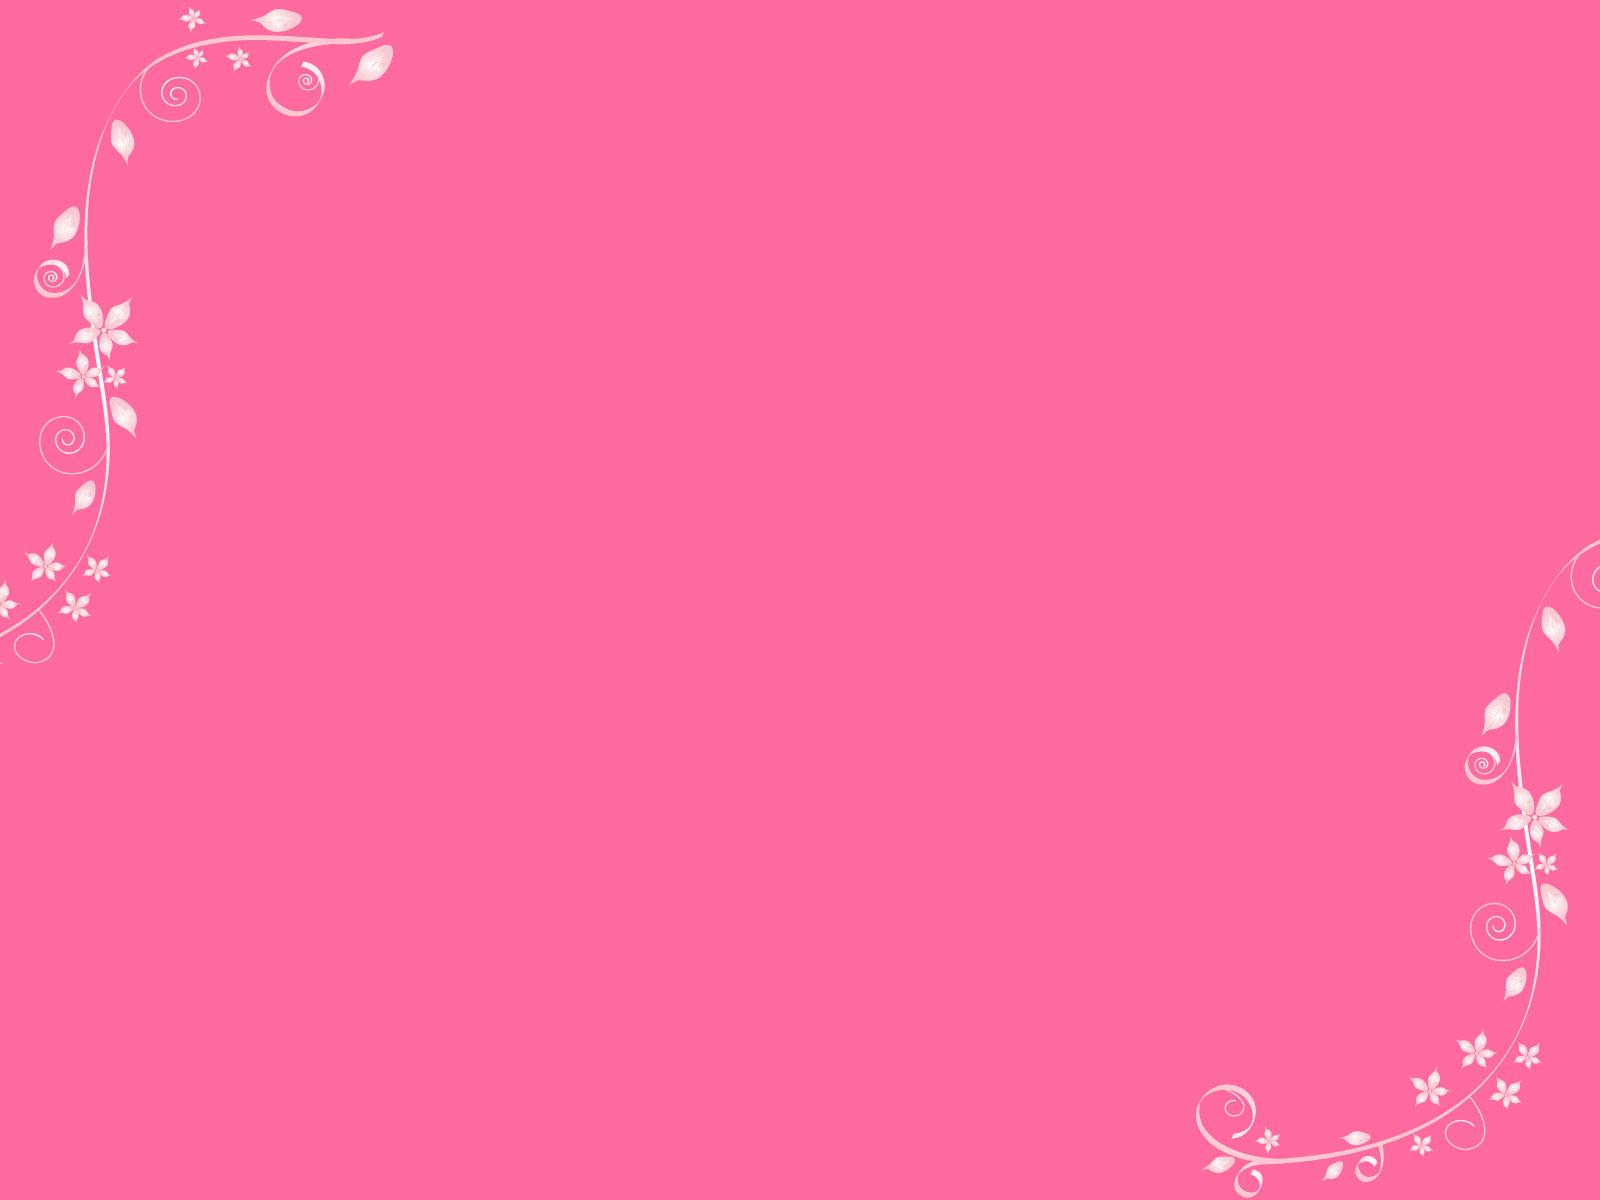 pink and black wallpaper border 8 hd wallpaper